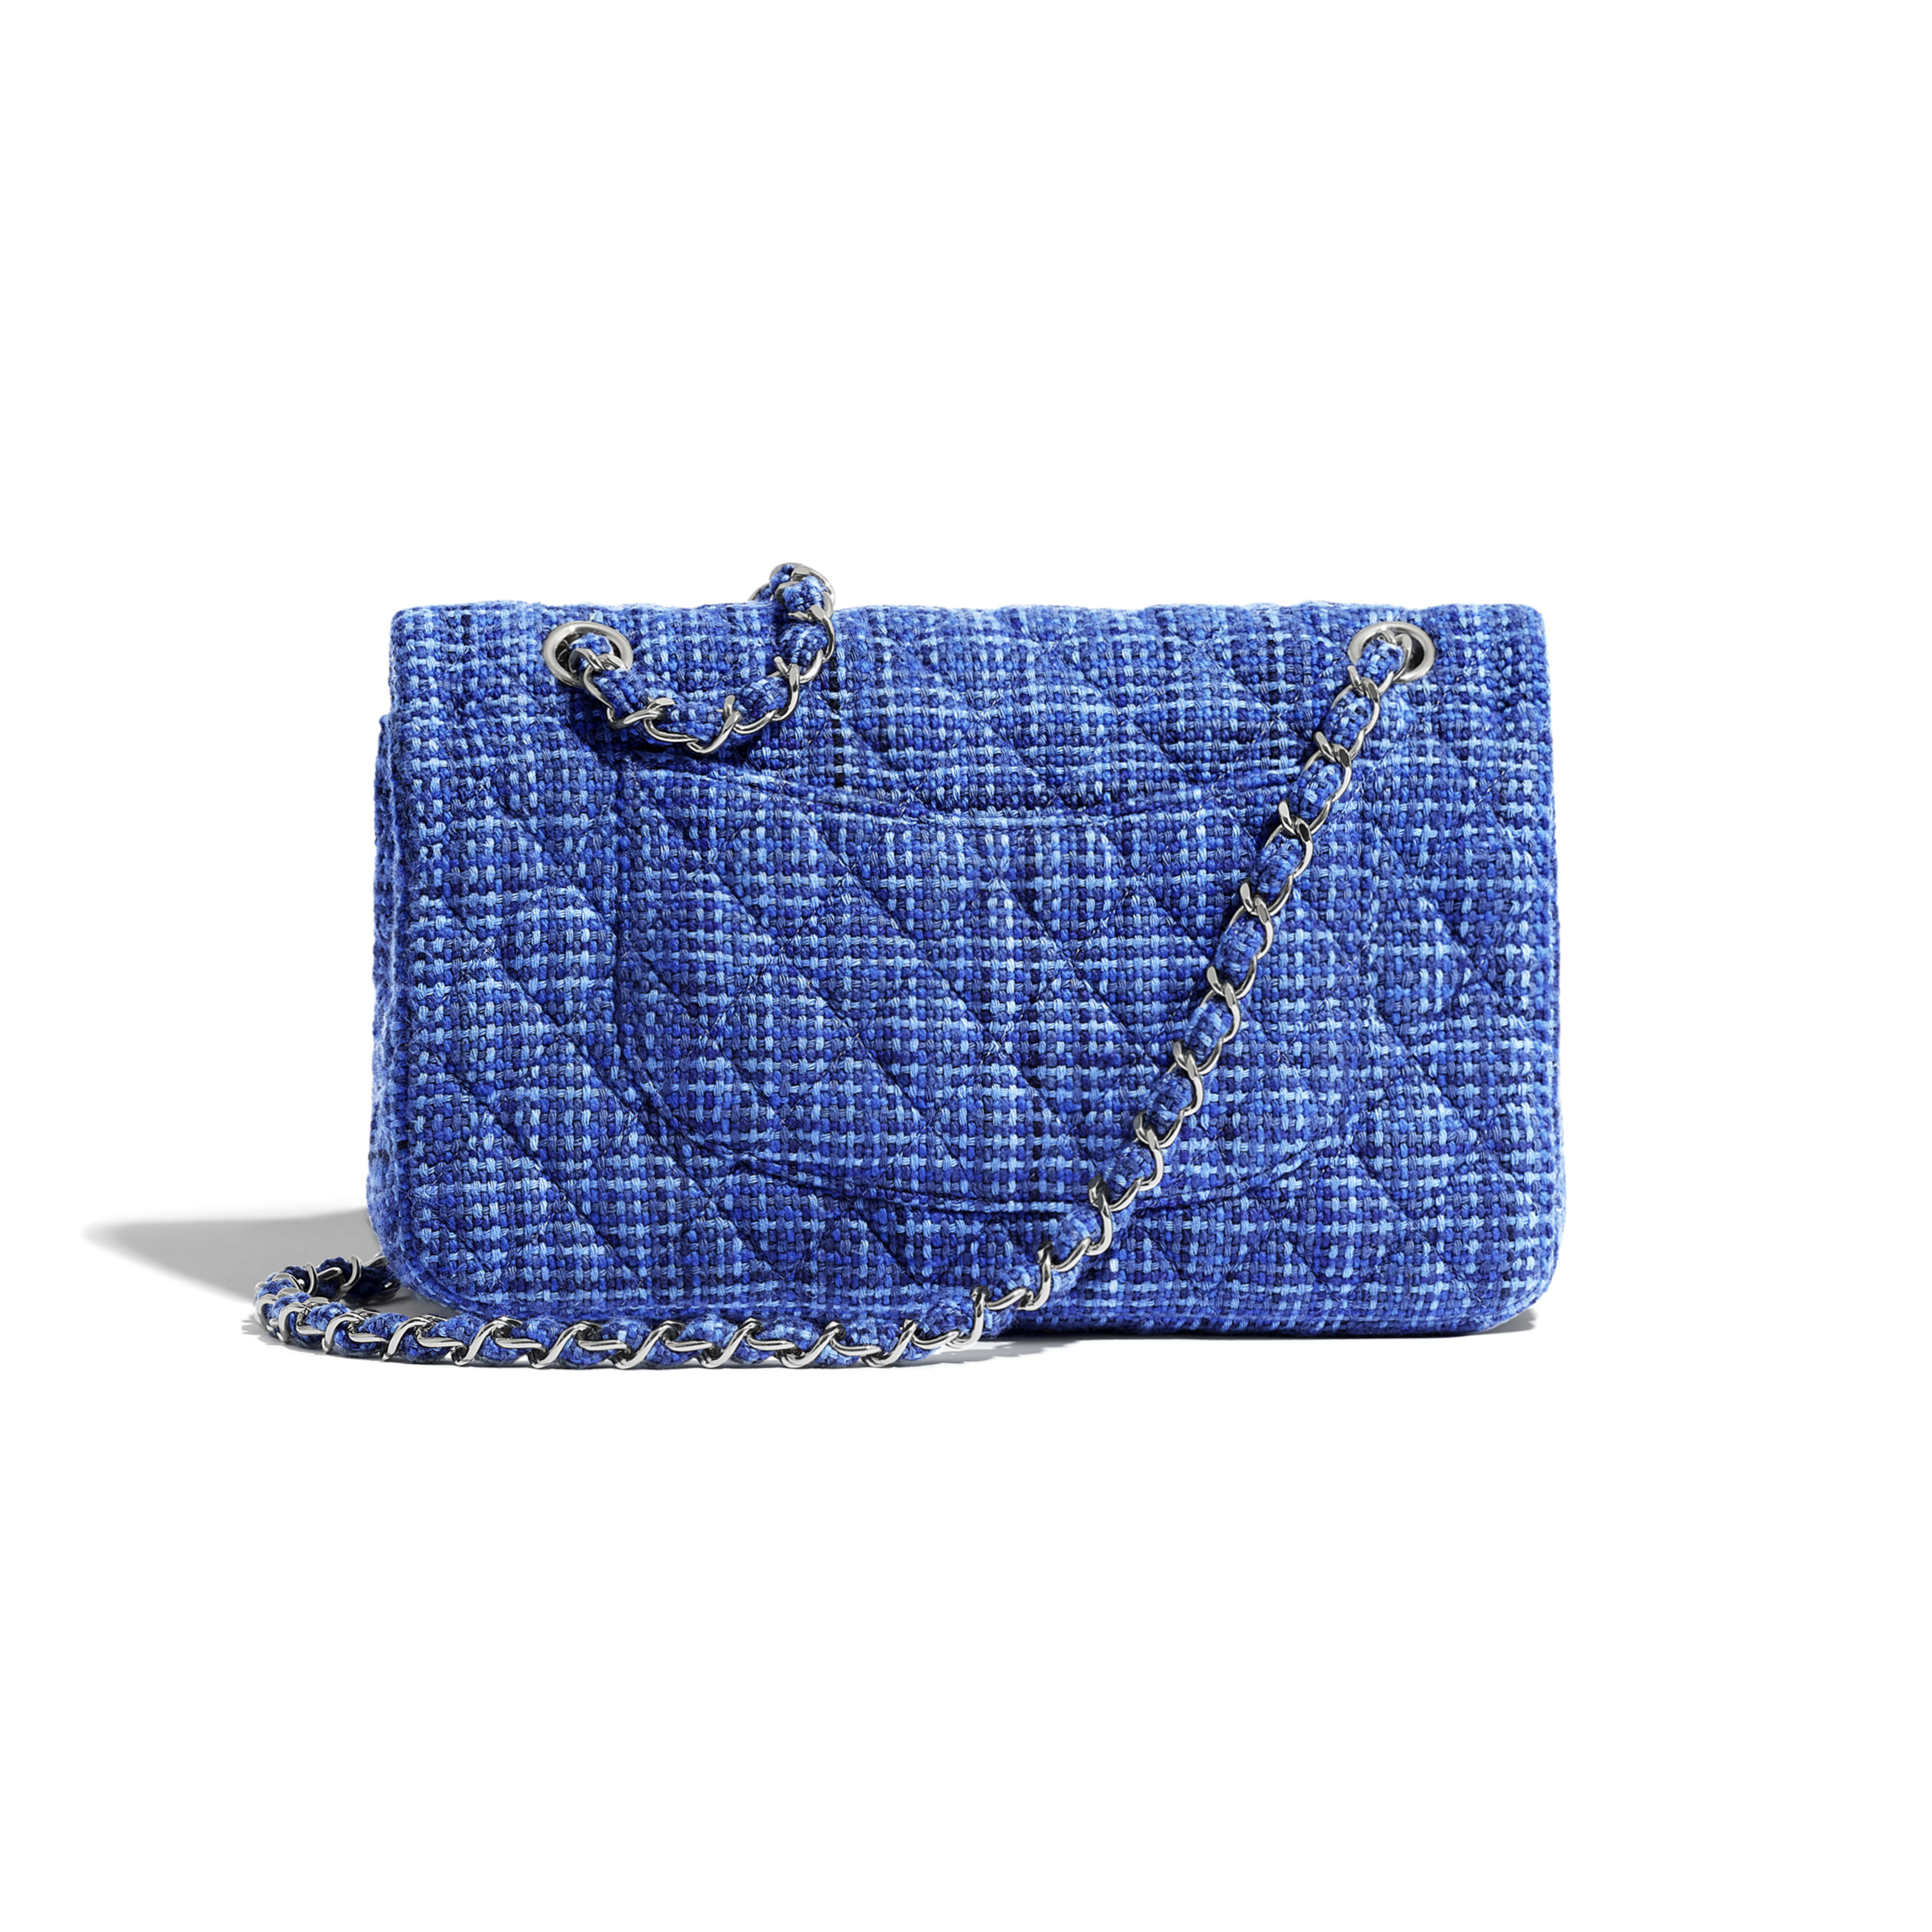 Classic Handbag - Blue - Tweed & Silver-Tone Metal - Alternative view - see full sized version